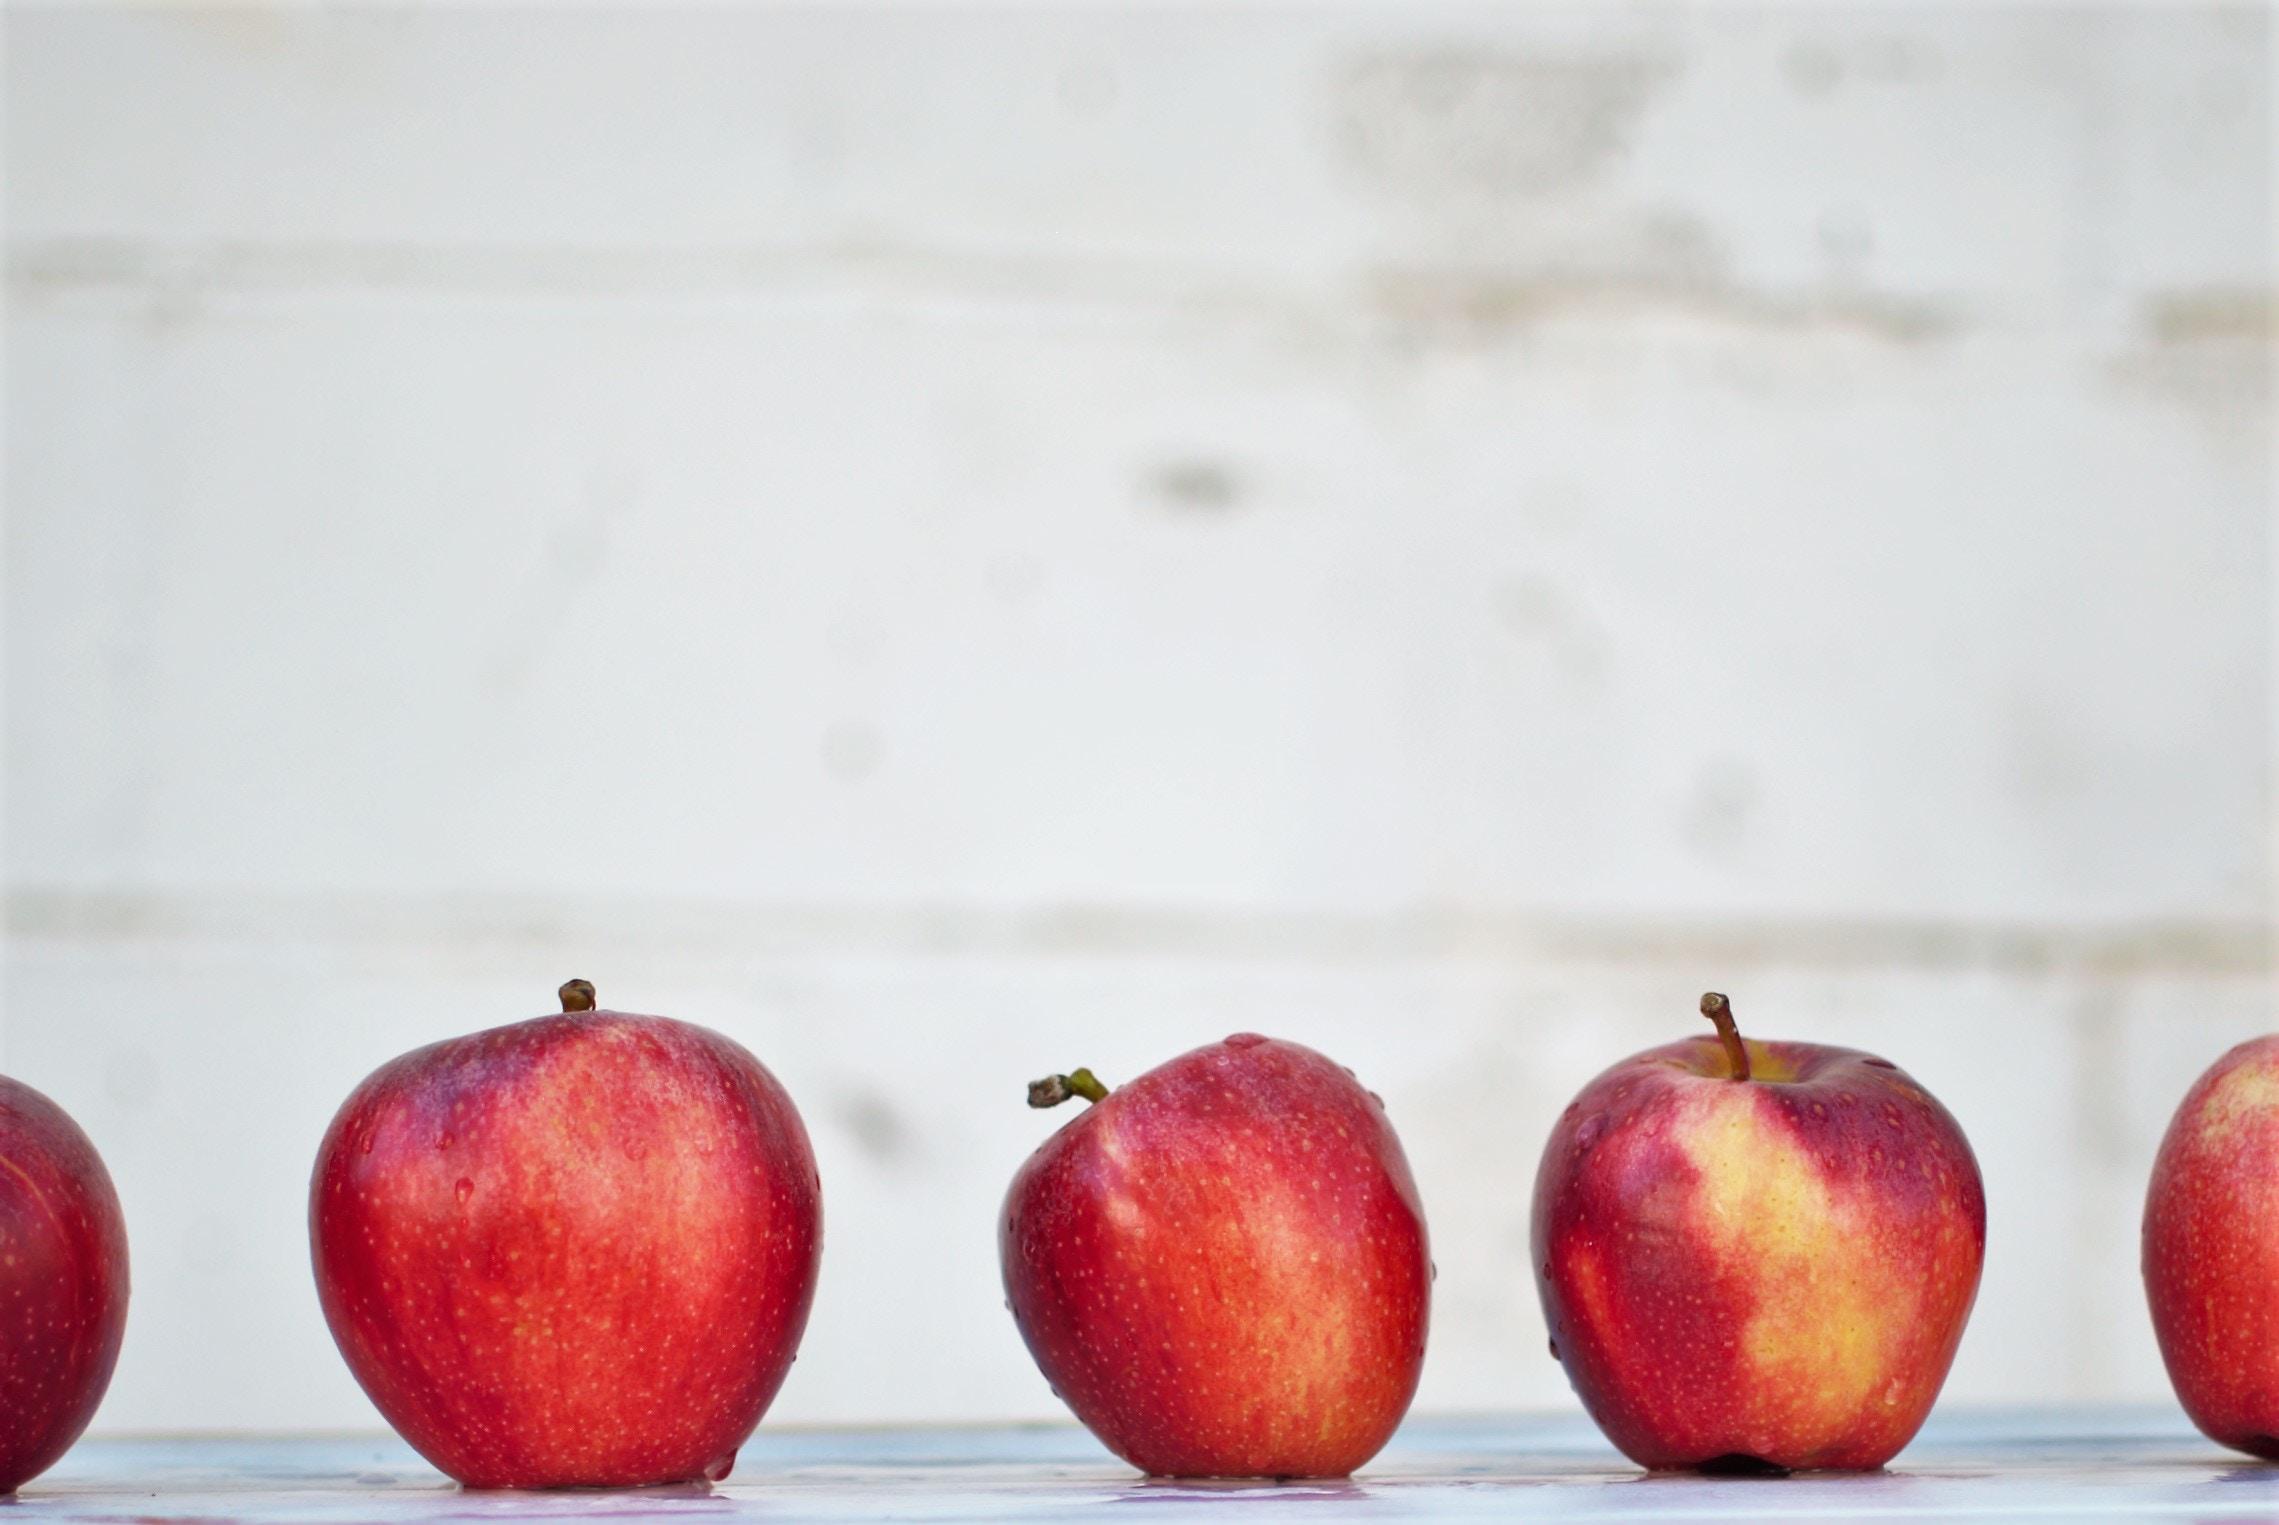 5. Apples -